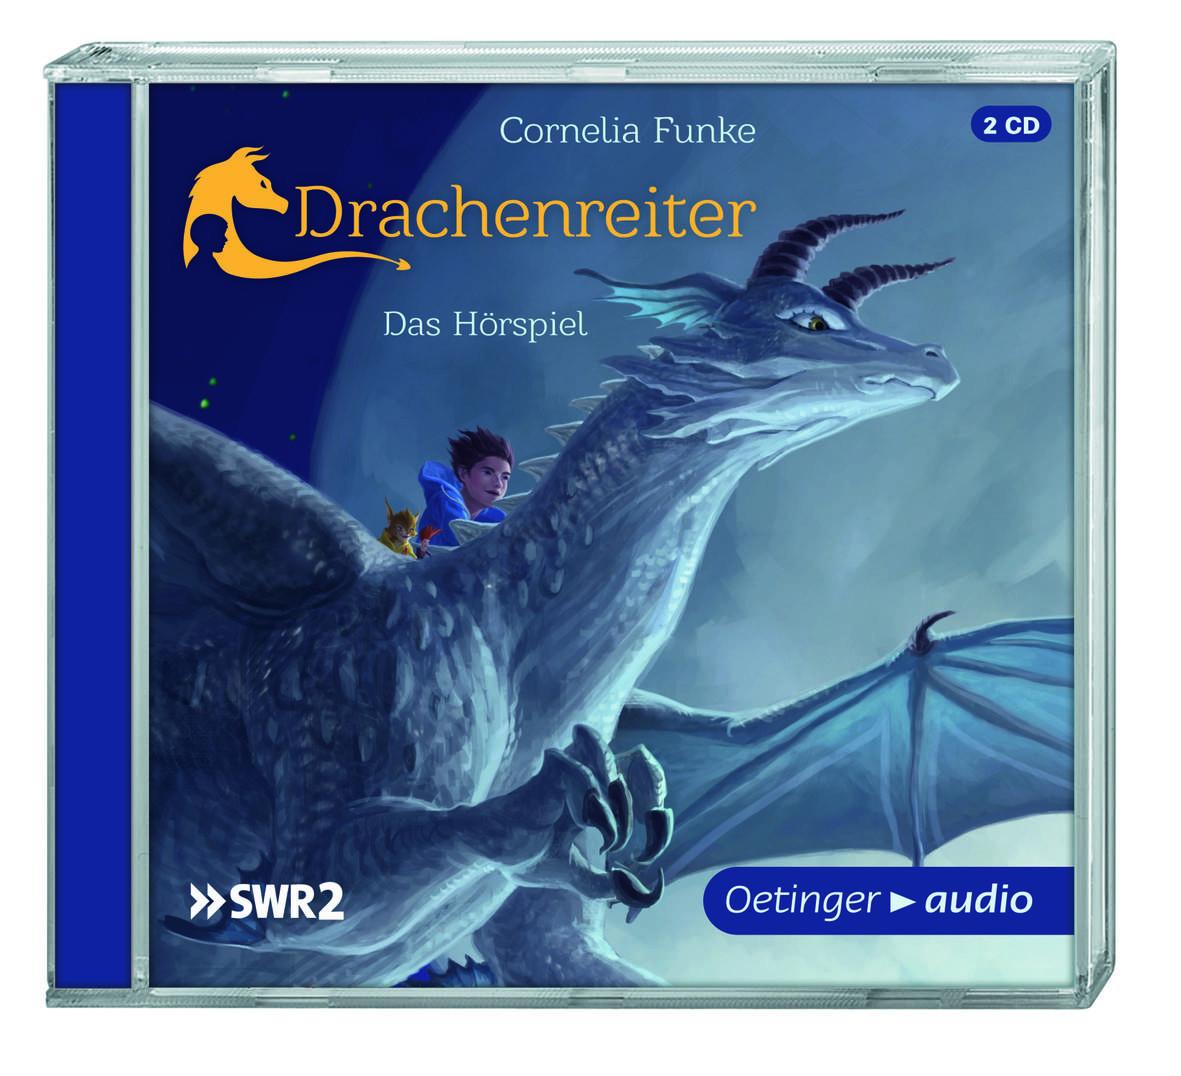 Cornelia Funke - Drachenreiter - Das Hörspiel (SWR)